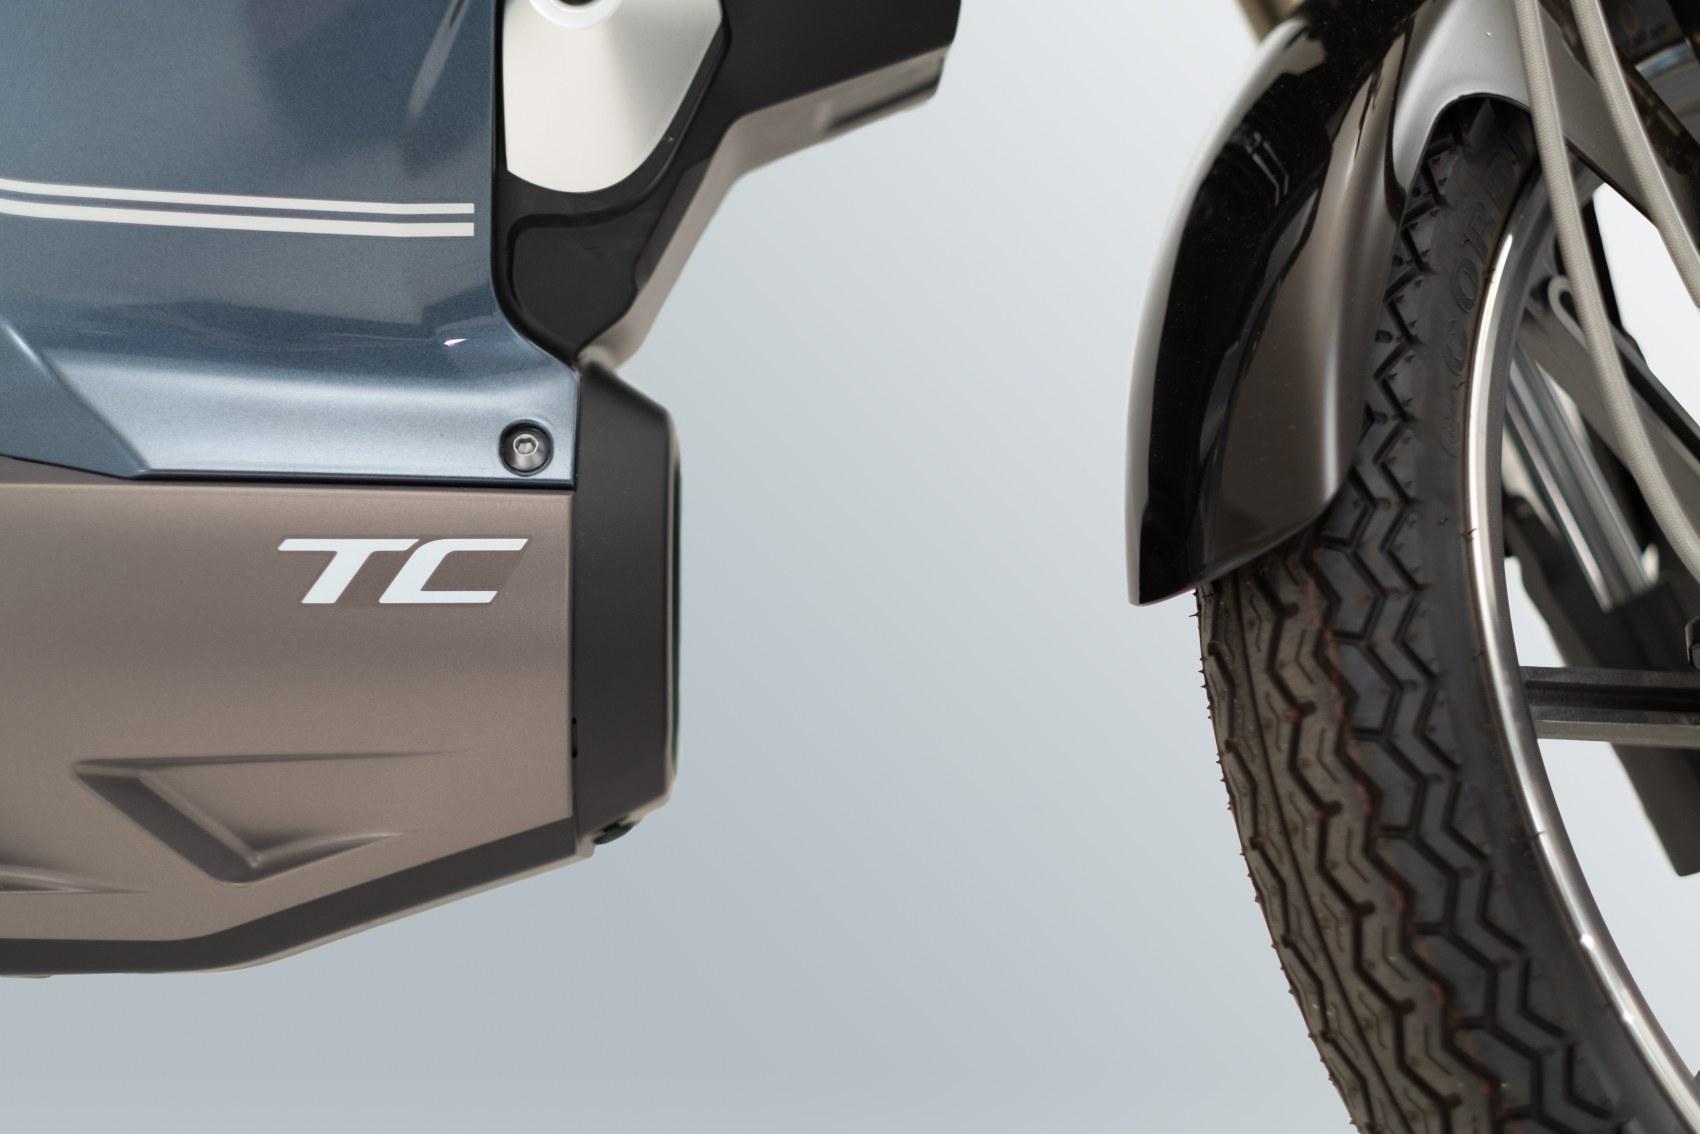 Super Soco TC electric motorcycle panel logo